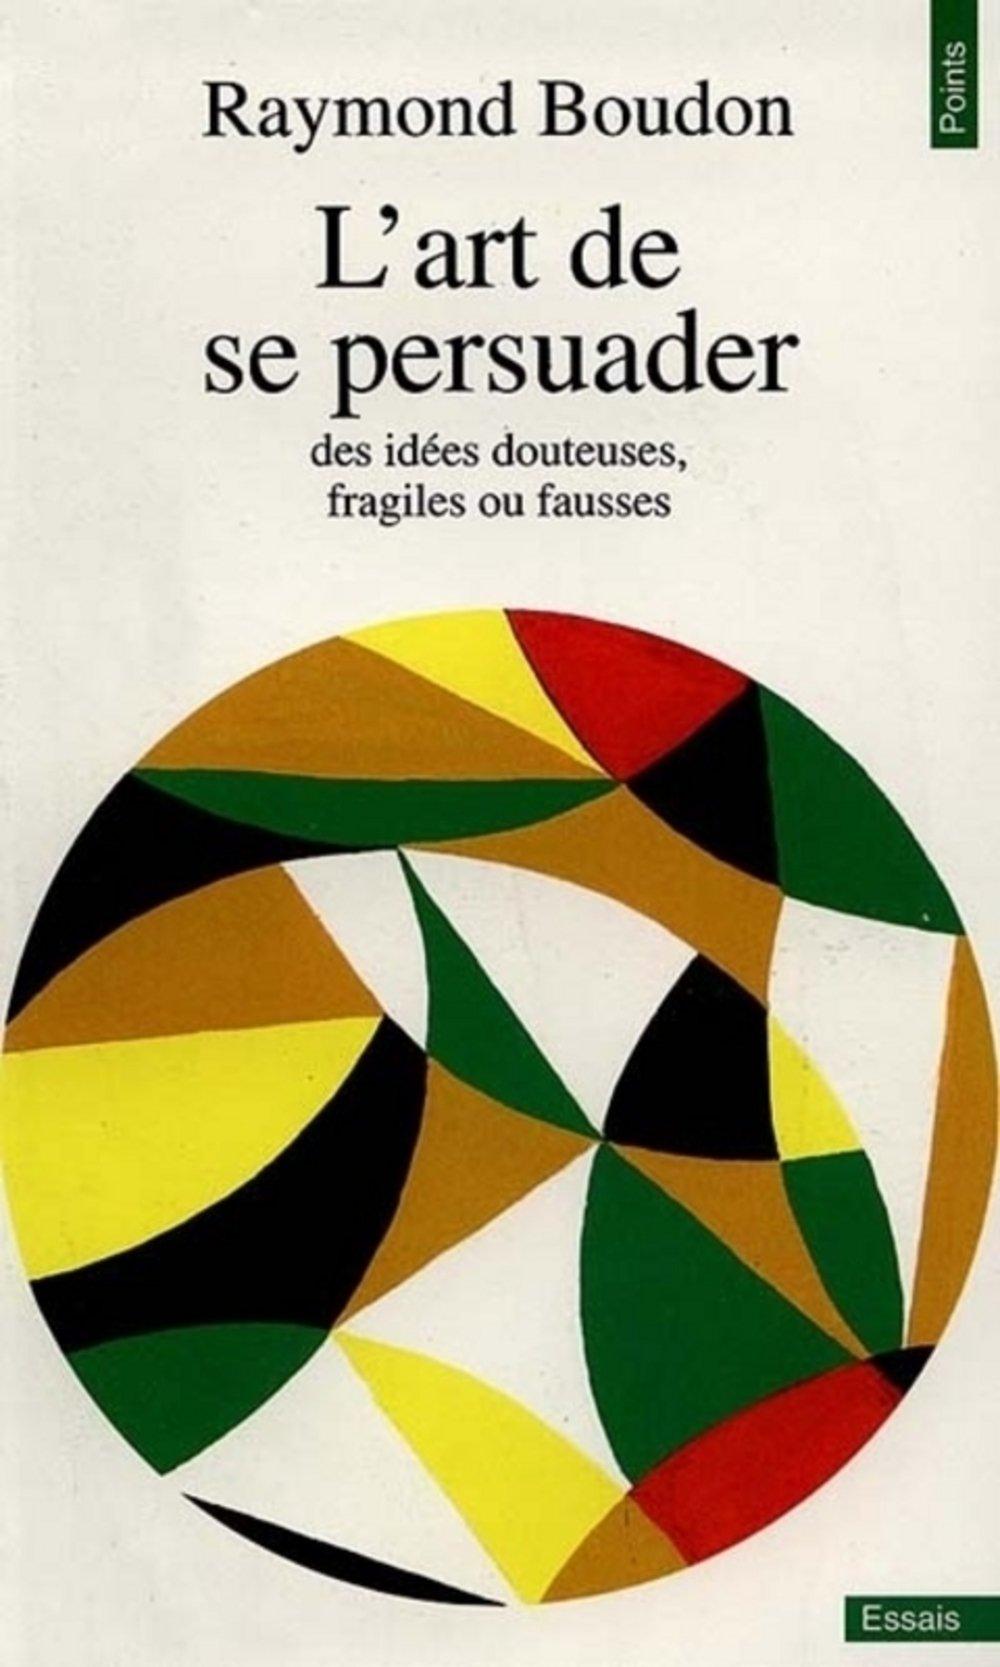 L'art de se persuader Poche – 2 février 1992 Raymond Boudon L' art de se persuader Seuil 2020131412